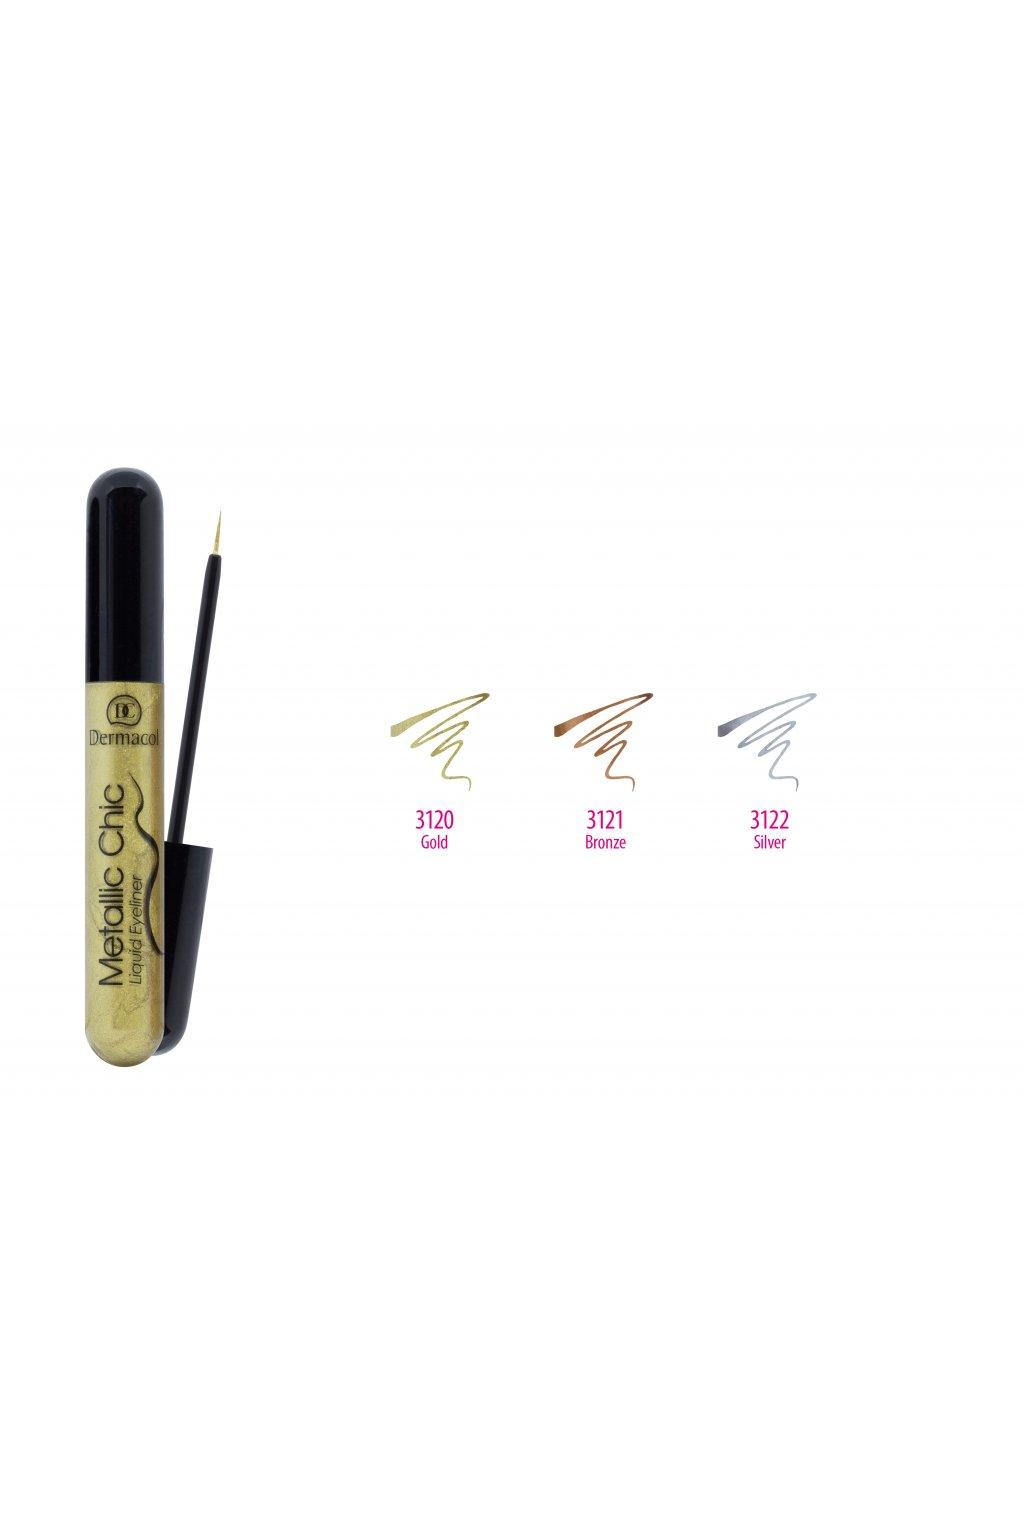 dermacol metallic chic liquid eyeliner 6ml